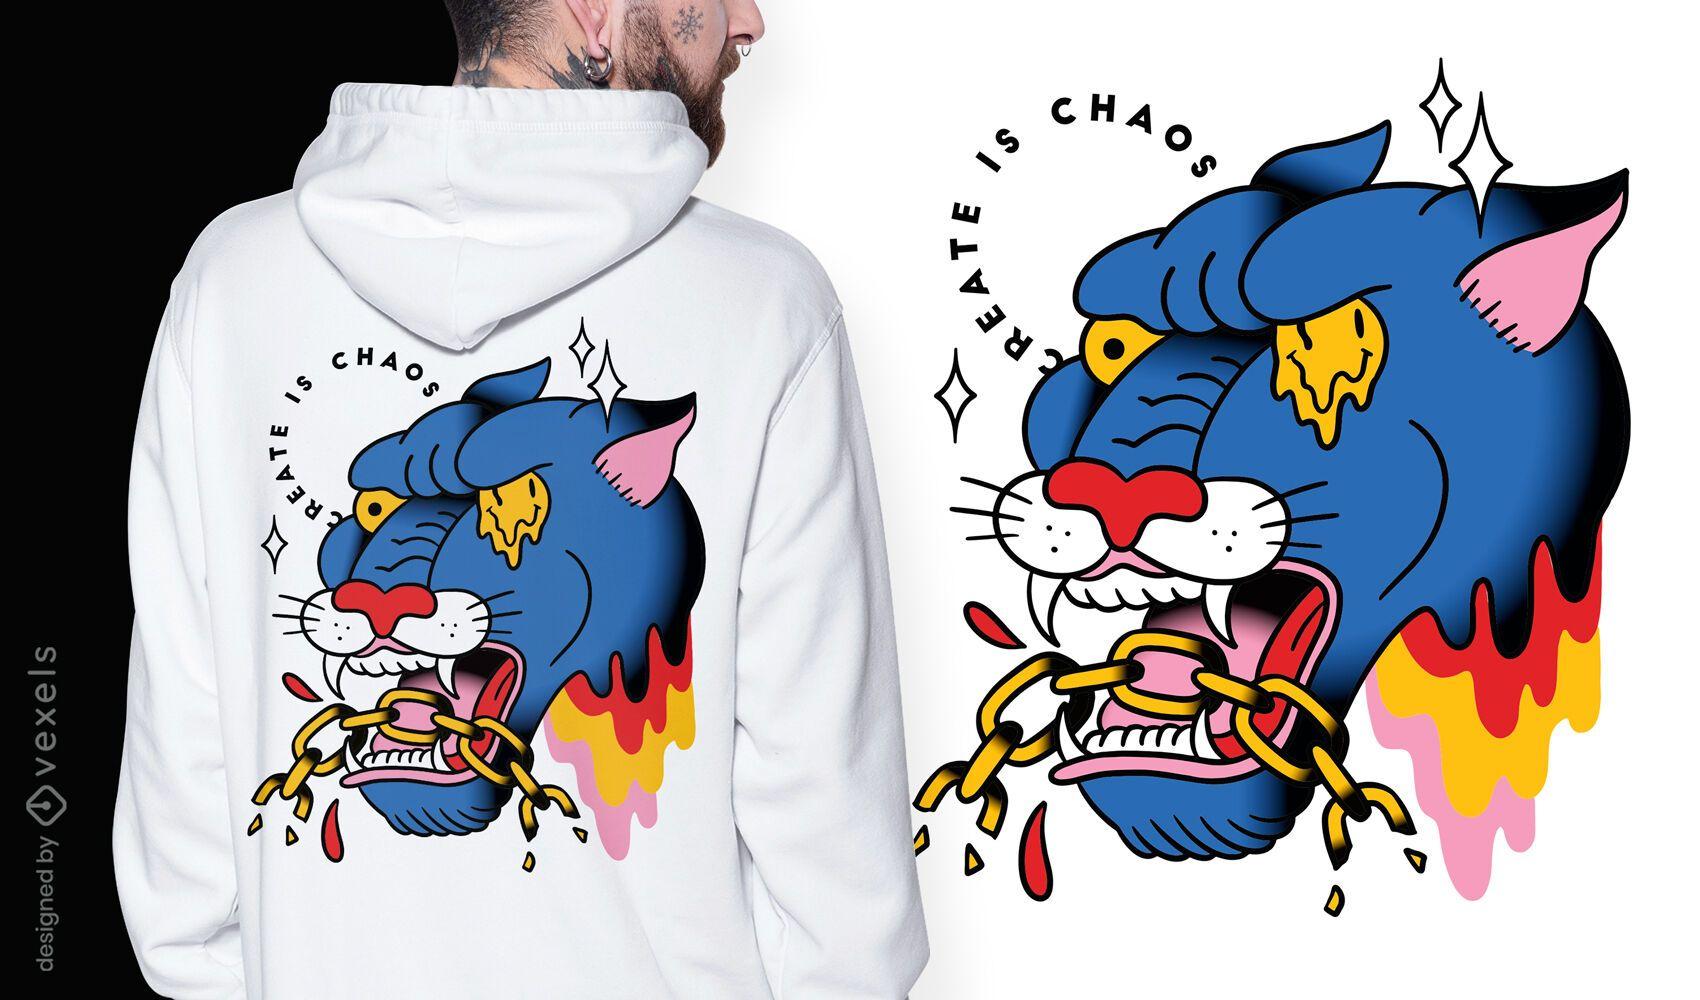 Trippy panther tattoo dise?o de camiseta surrealista